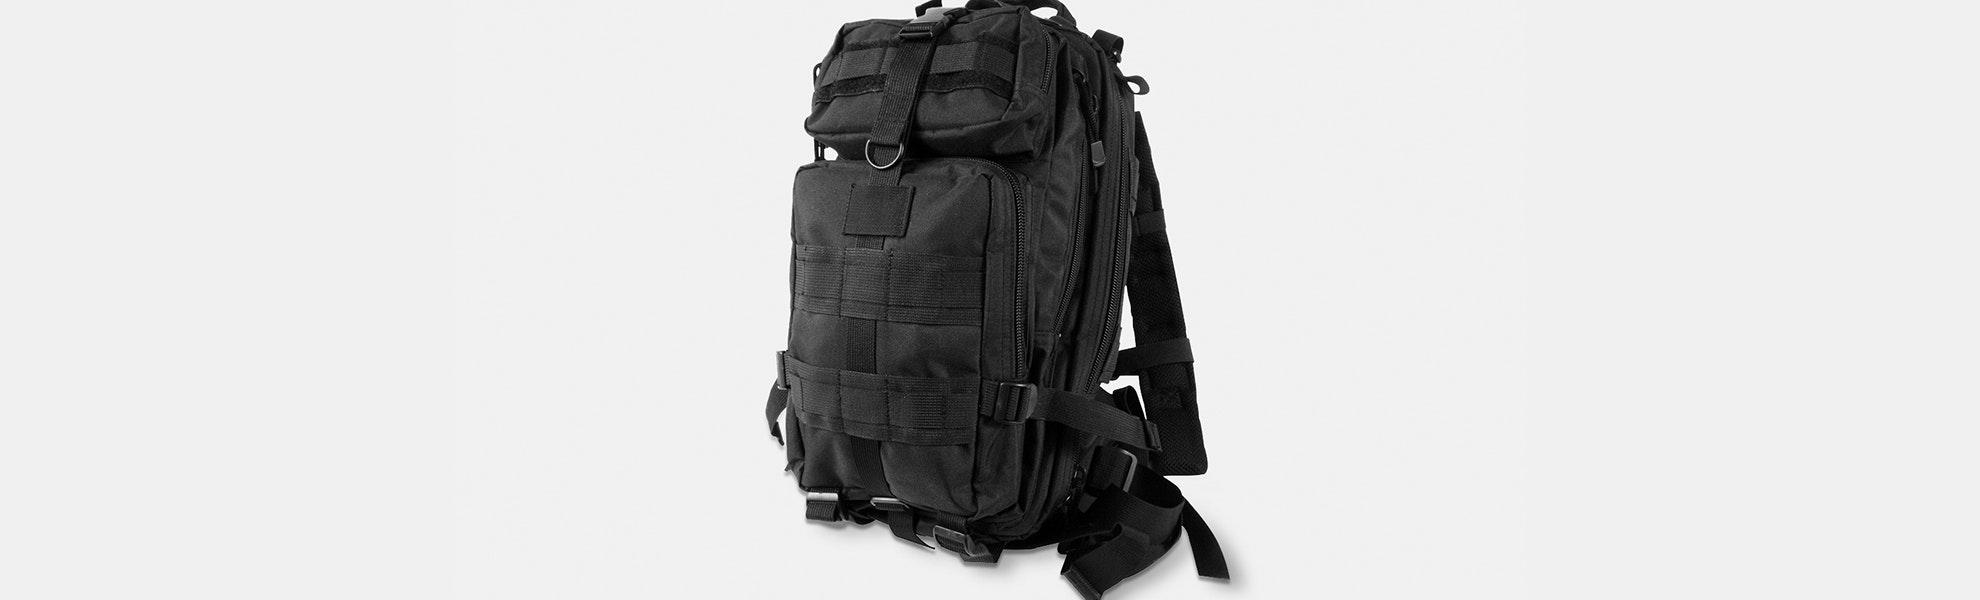 Rothco Medium Transport Pack